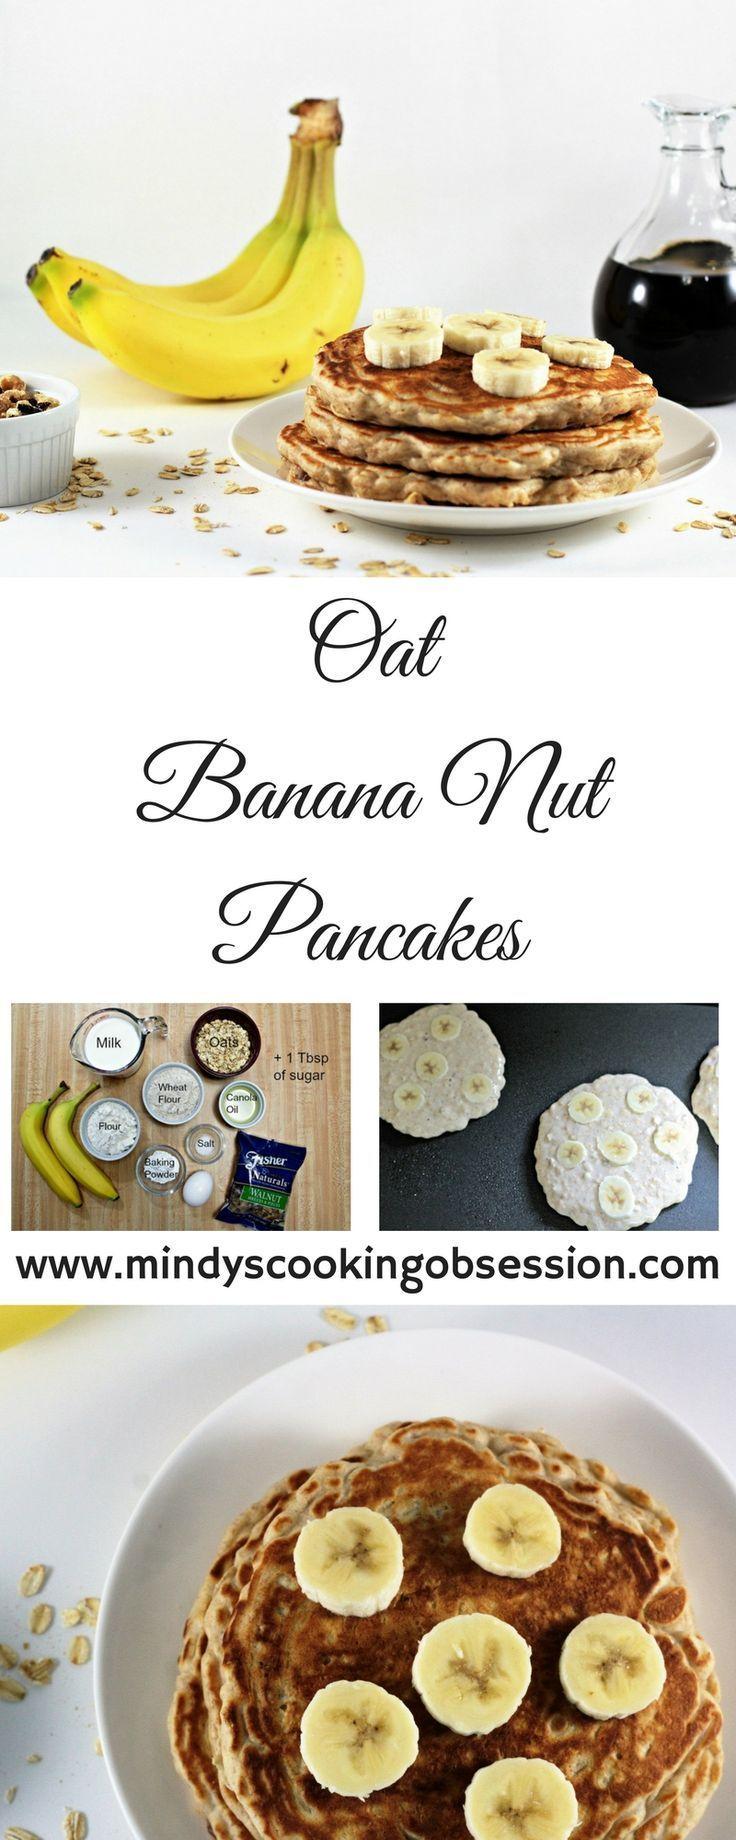 Oat banana nut pancakes recipe banana nut pancakes pancakes and oat banana nut pancakes recipe banana nut pancakes pancakes and bananas ccuart Image collections